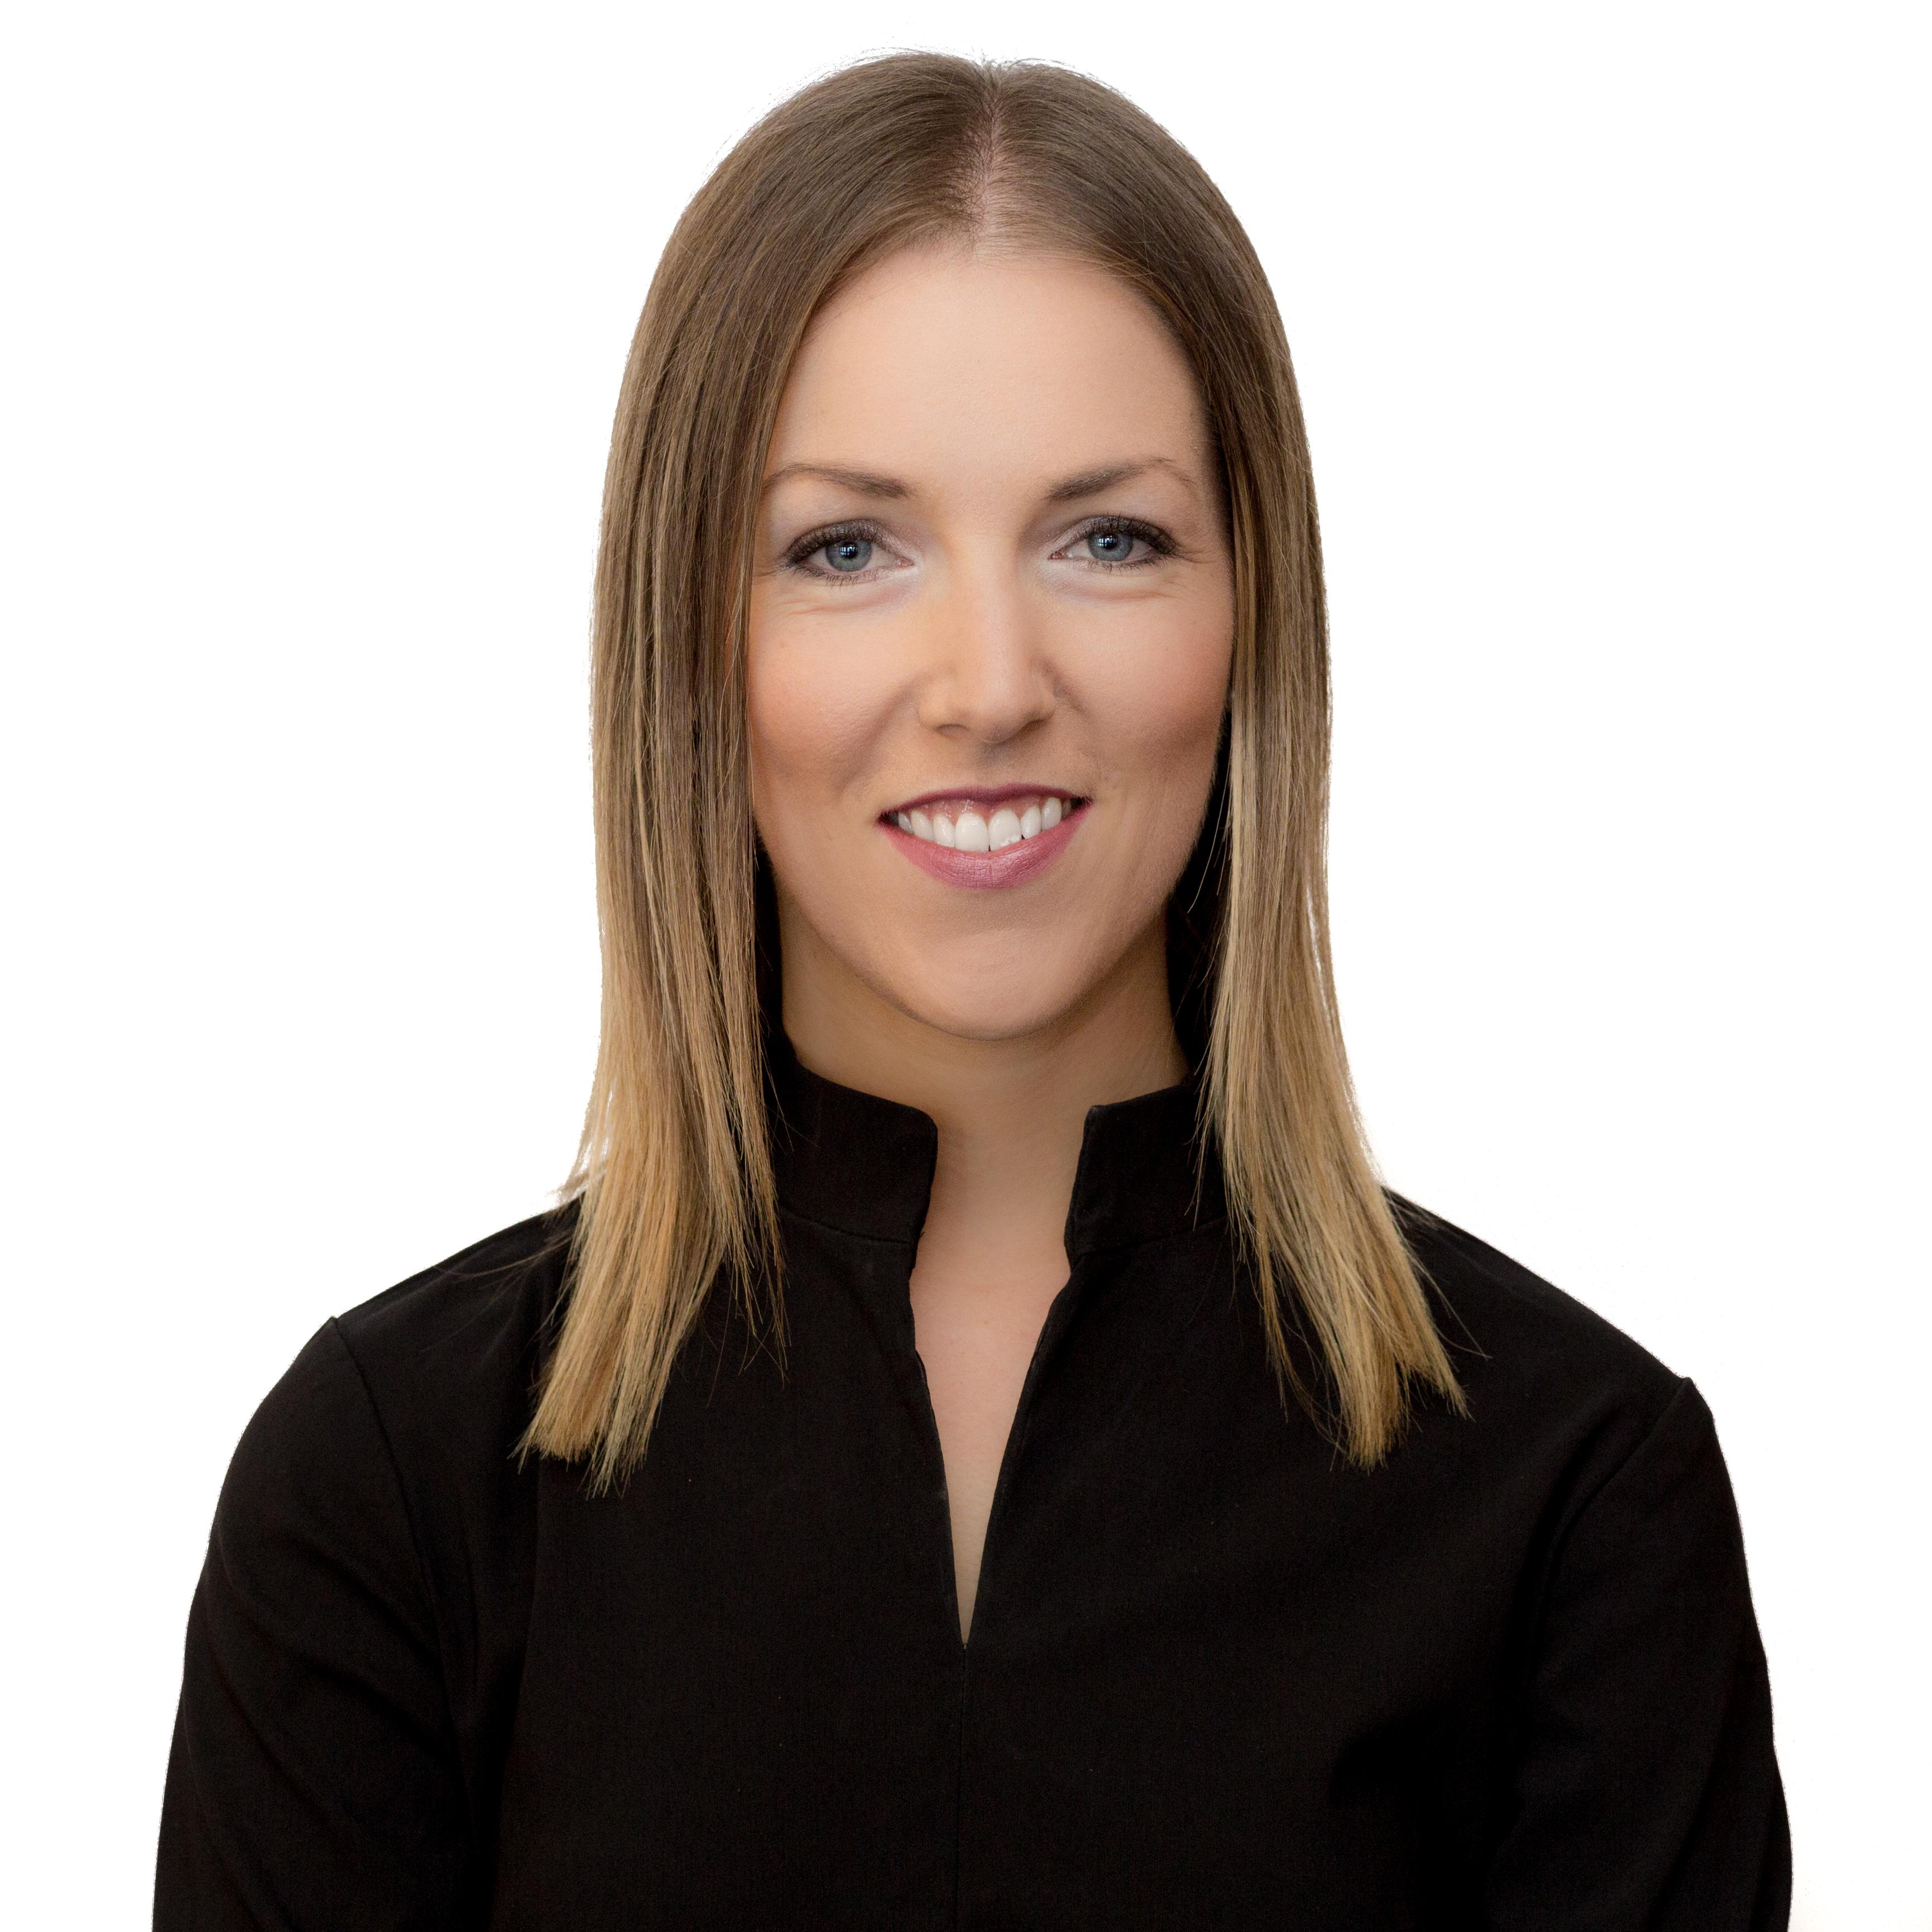 Dr Claire McCullough